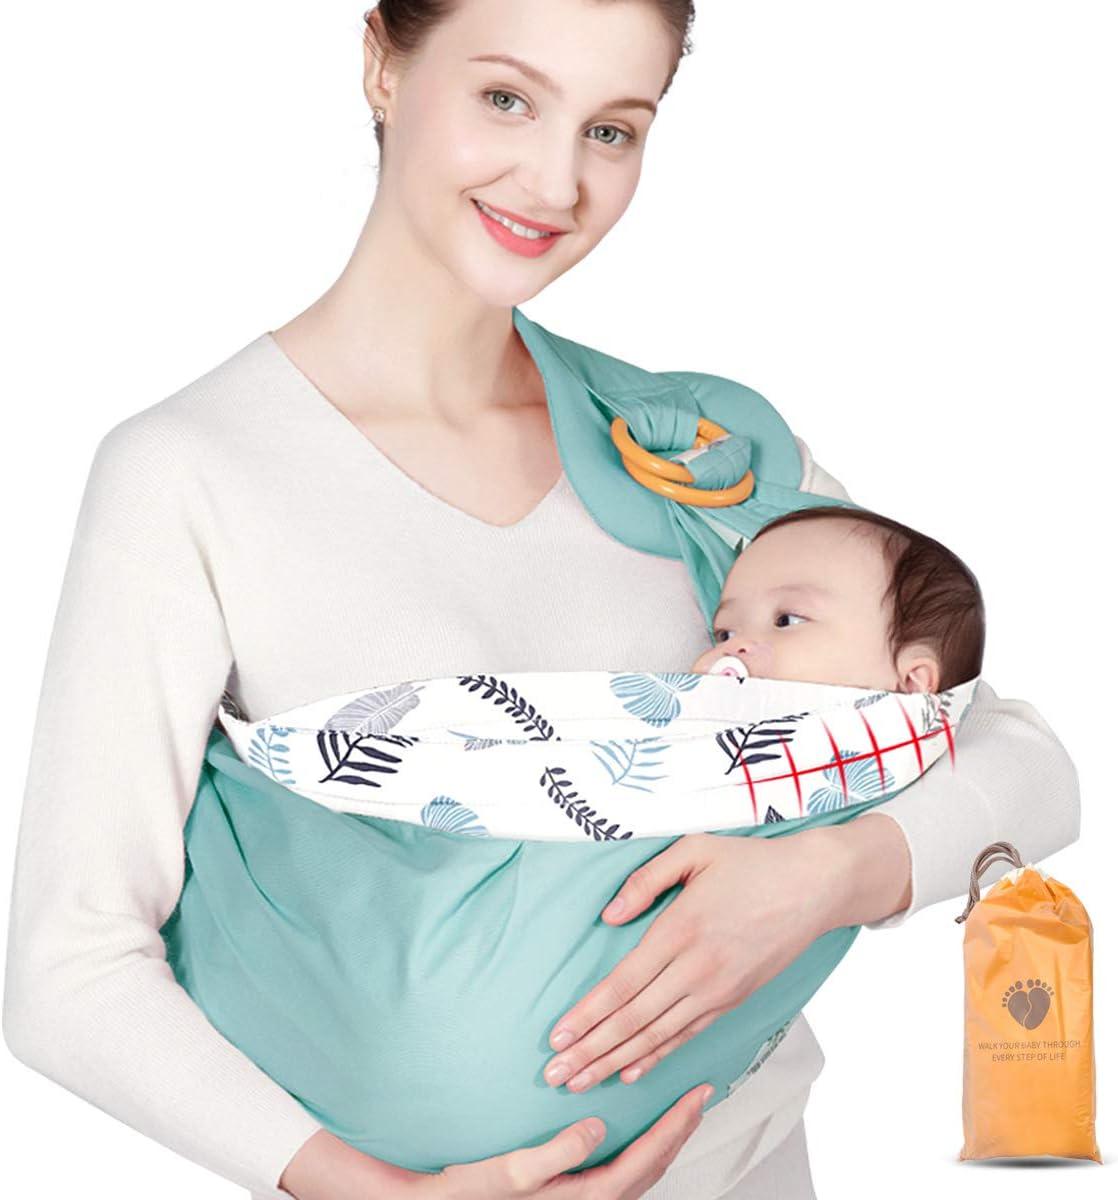 Upchase Fular Portabebés, Ergonómico Porteo Bebe. Unisex Ajustable; Para Padres. la Mochila Portabebes Multiusos Apropiada Hasta 15 kg, Verano e Invierno, Sling Wrap